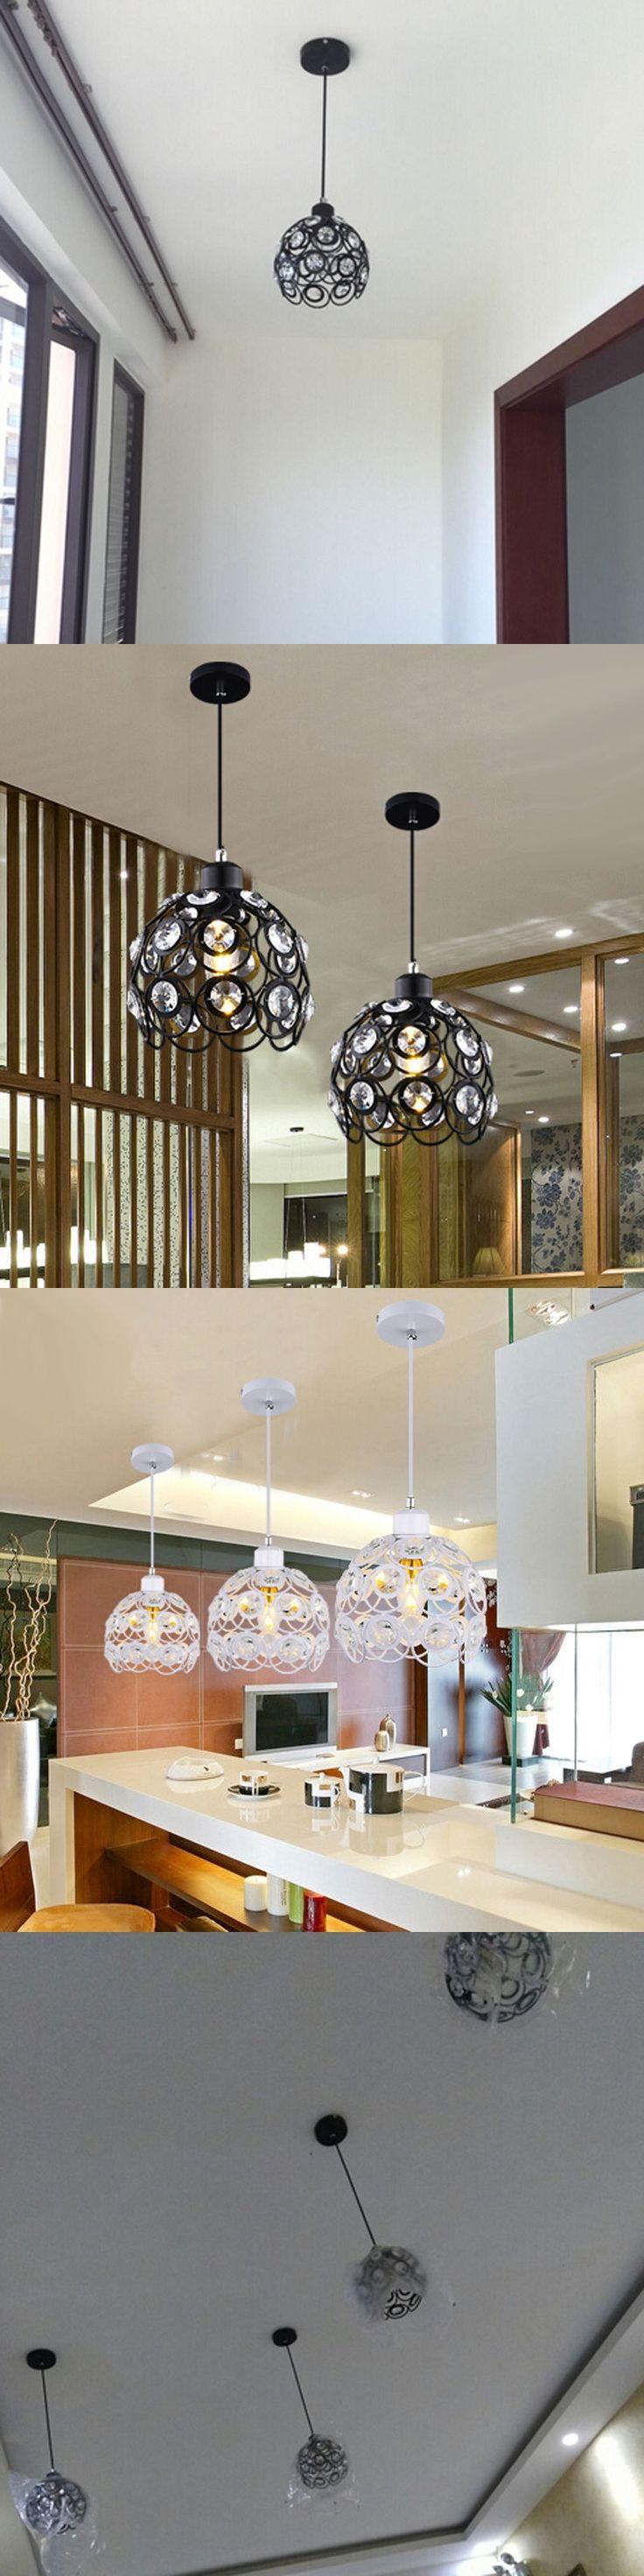 Best 25 black iron chandelier ideas on pinterest black 5w modern crystal pendant lamps design whiteblack iron chandelier for home lights bar living arubaitofo Choice Image